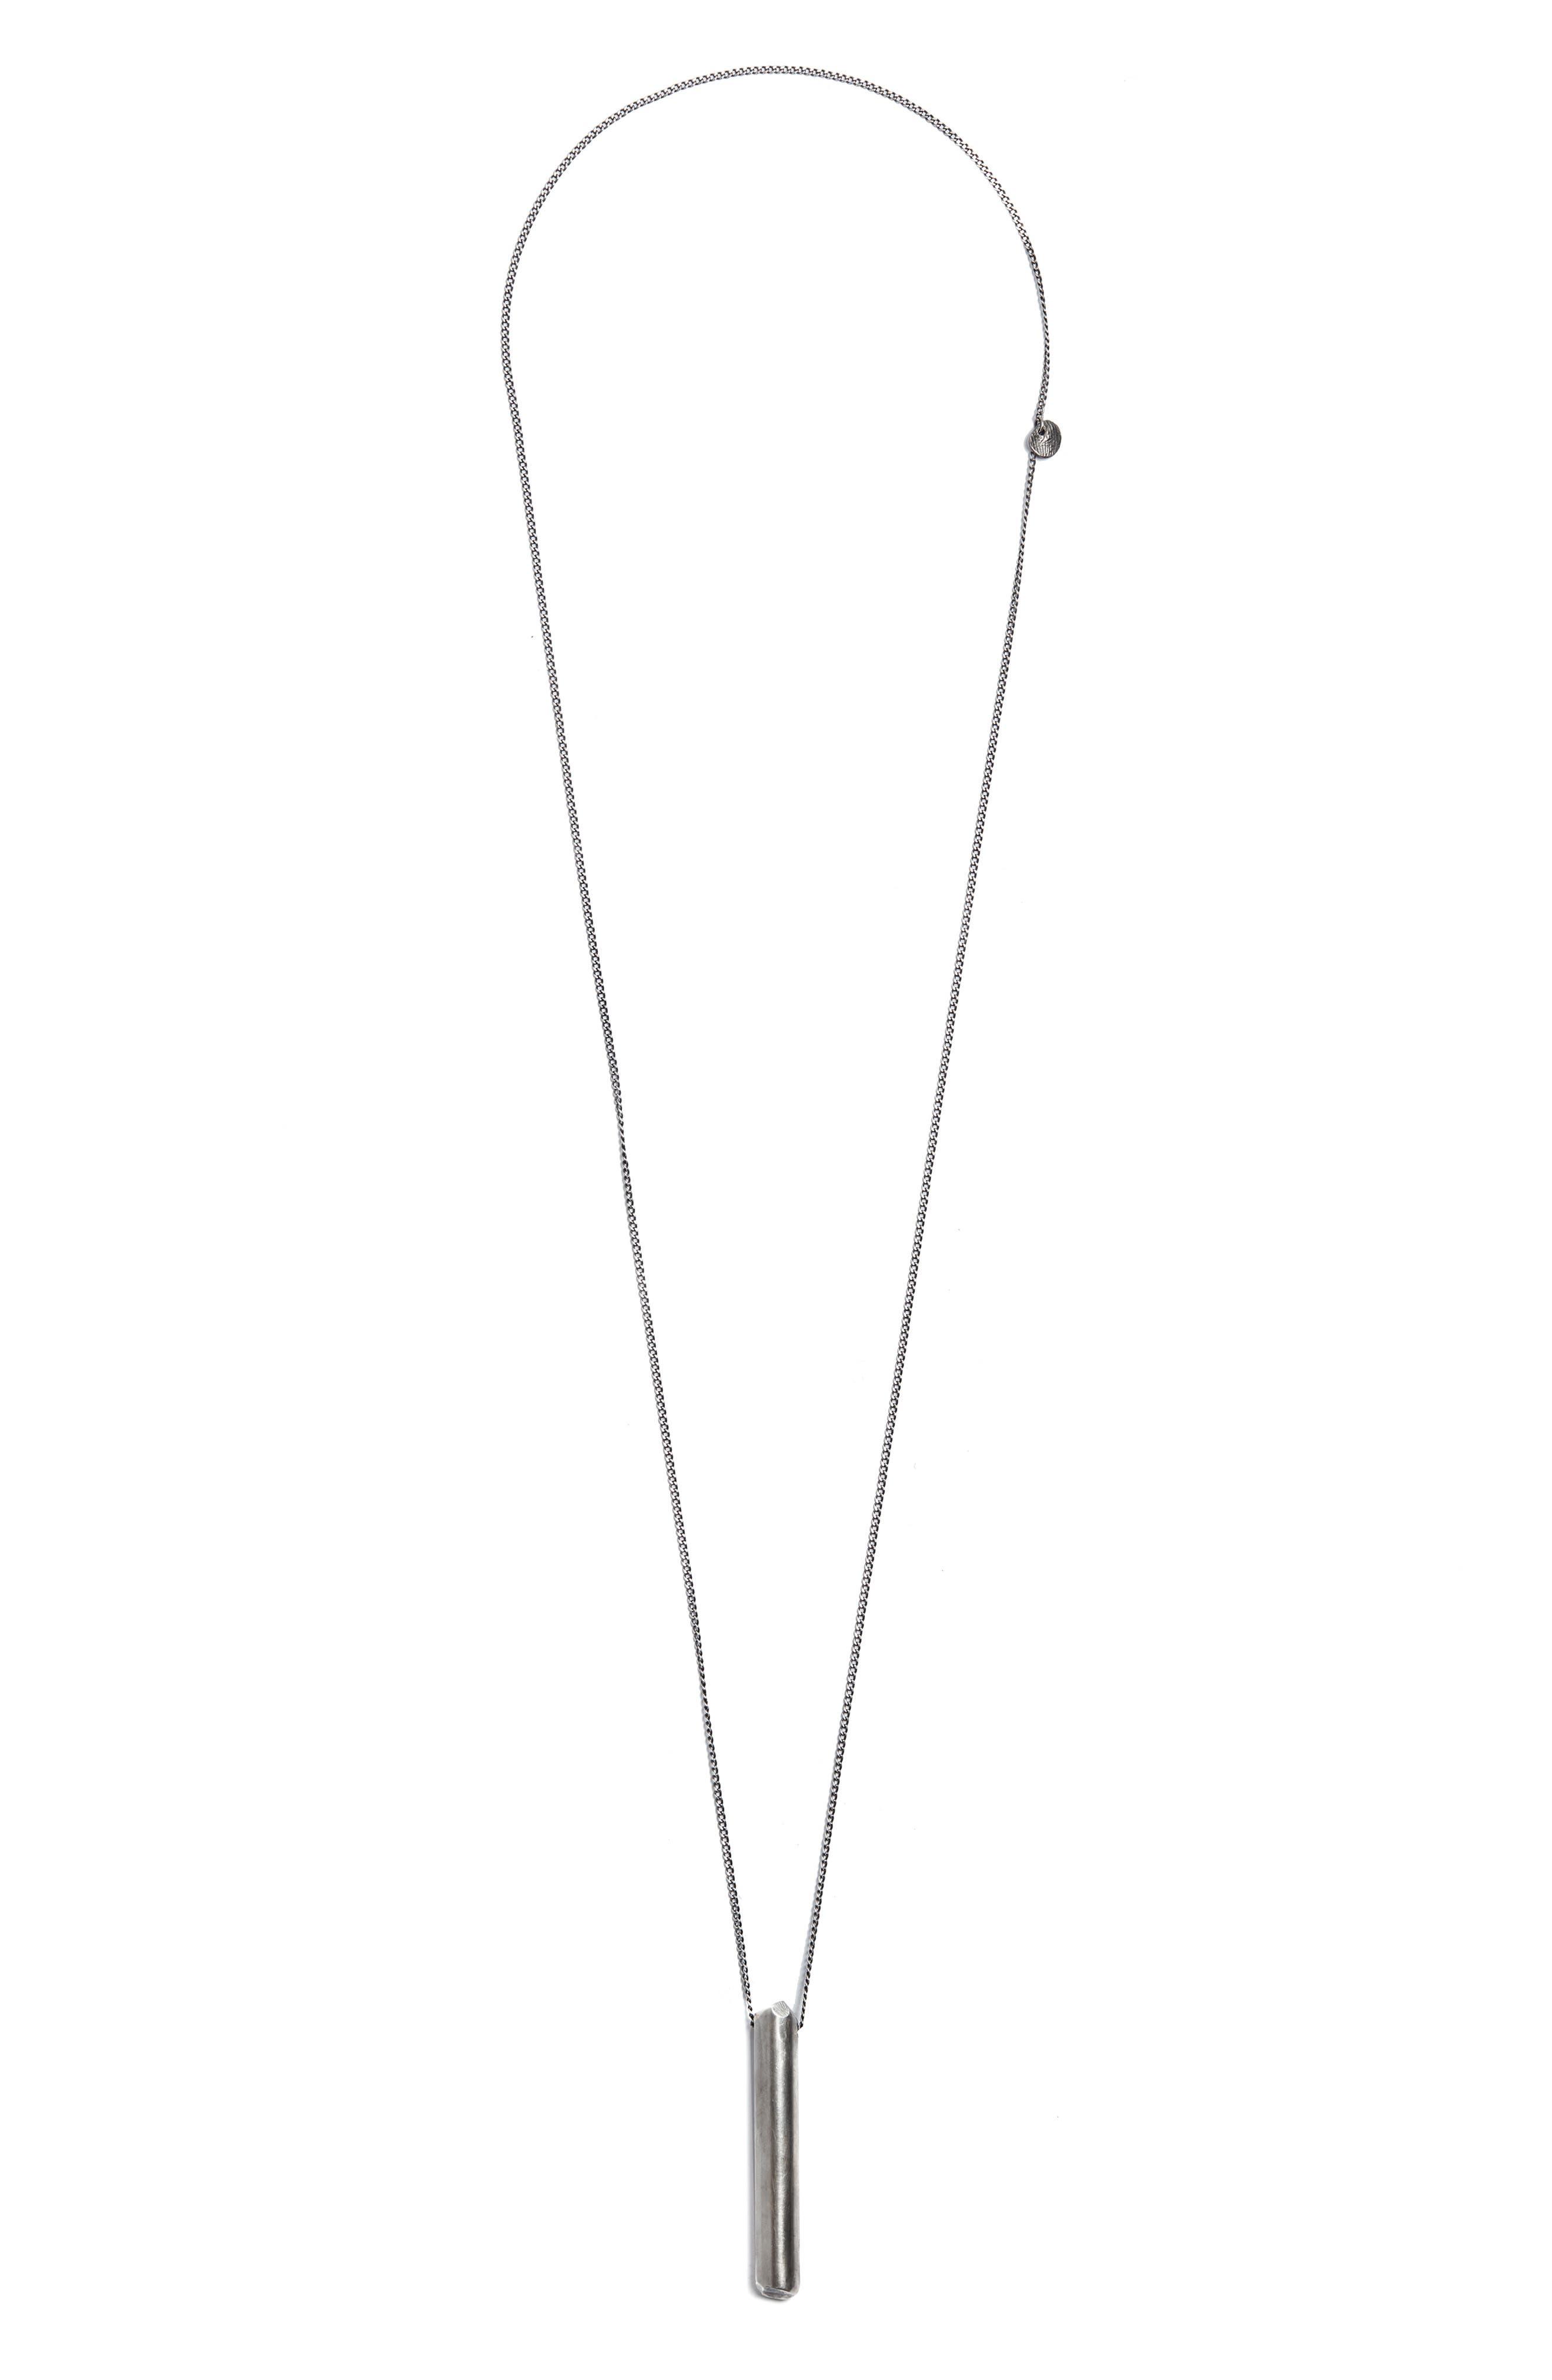 Rod Pendant Necklace,                         Main,                         color, Silver